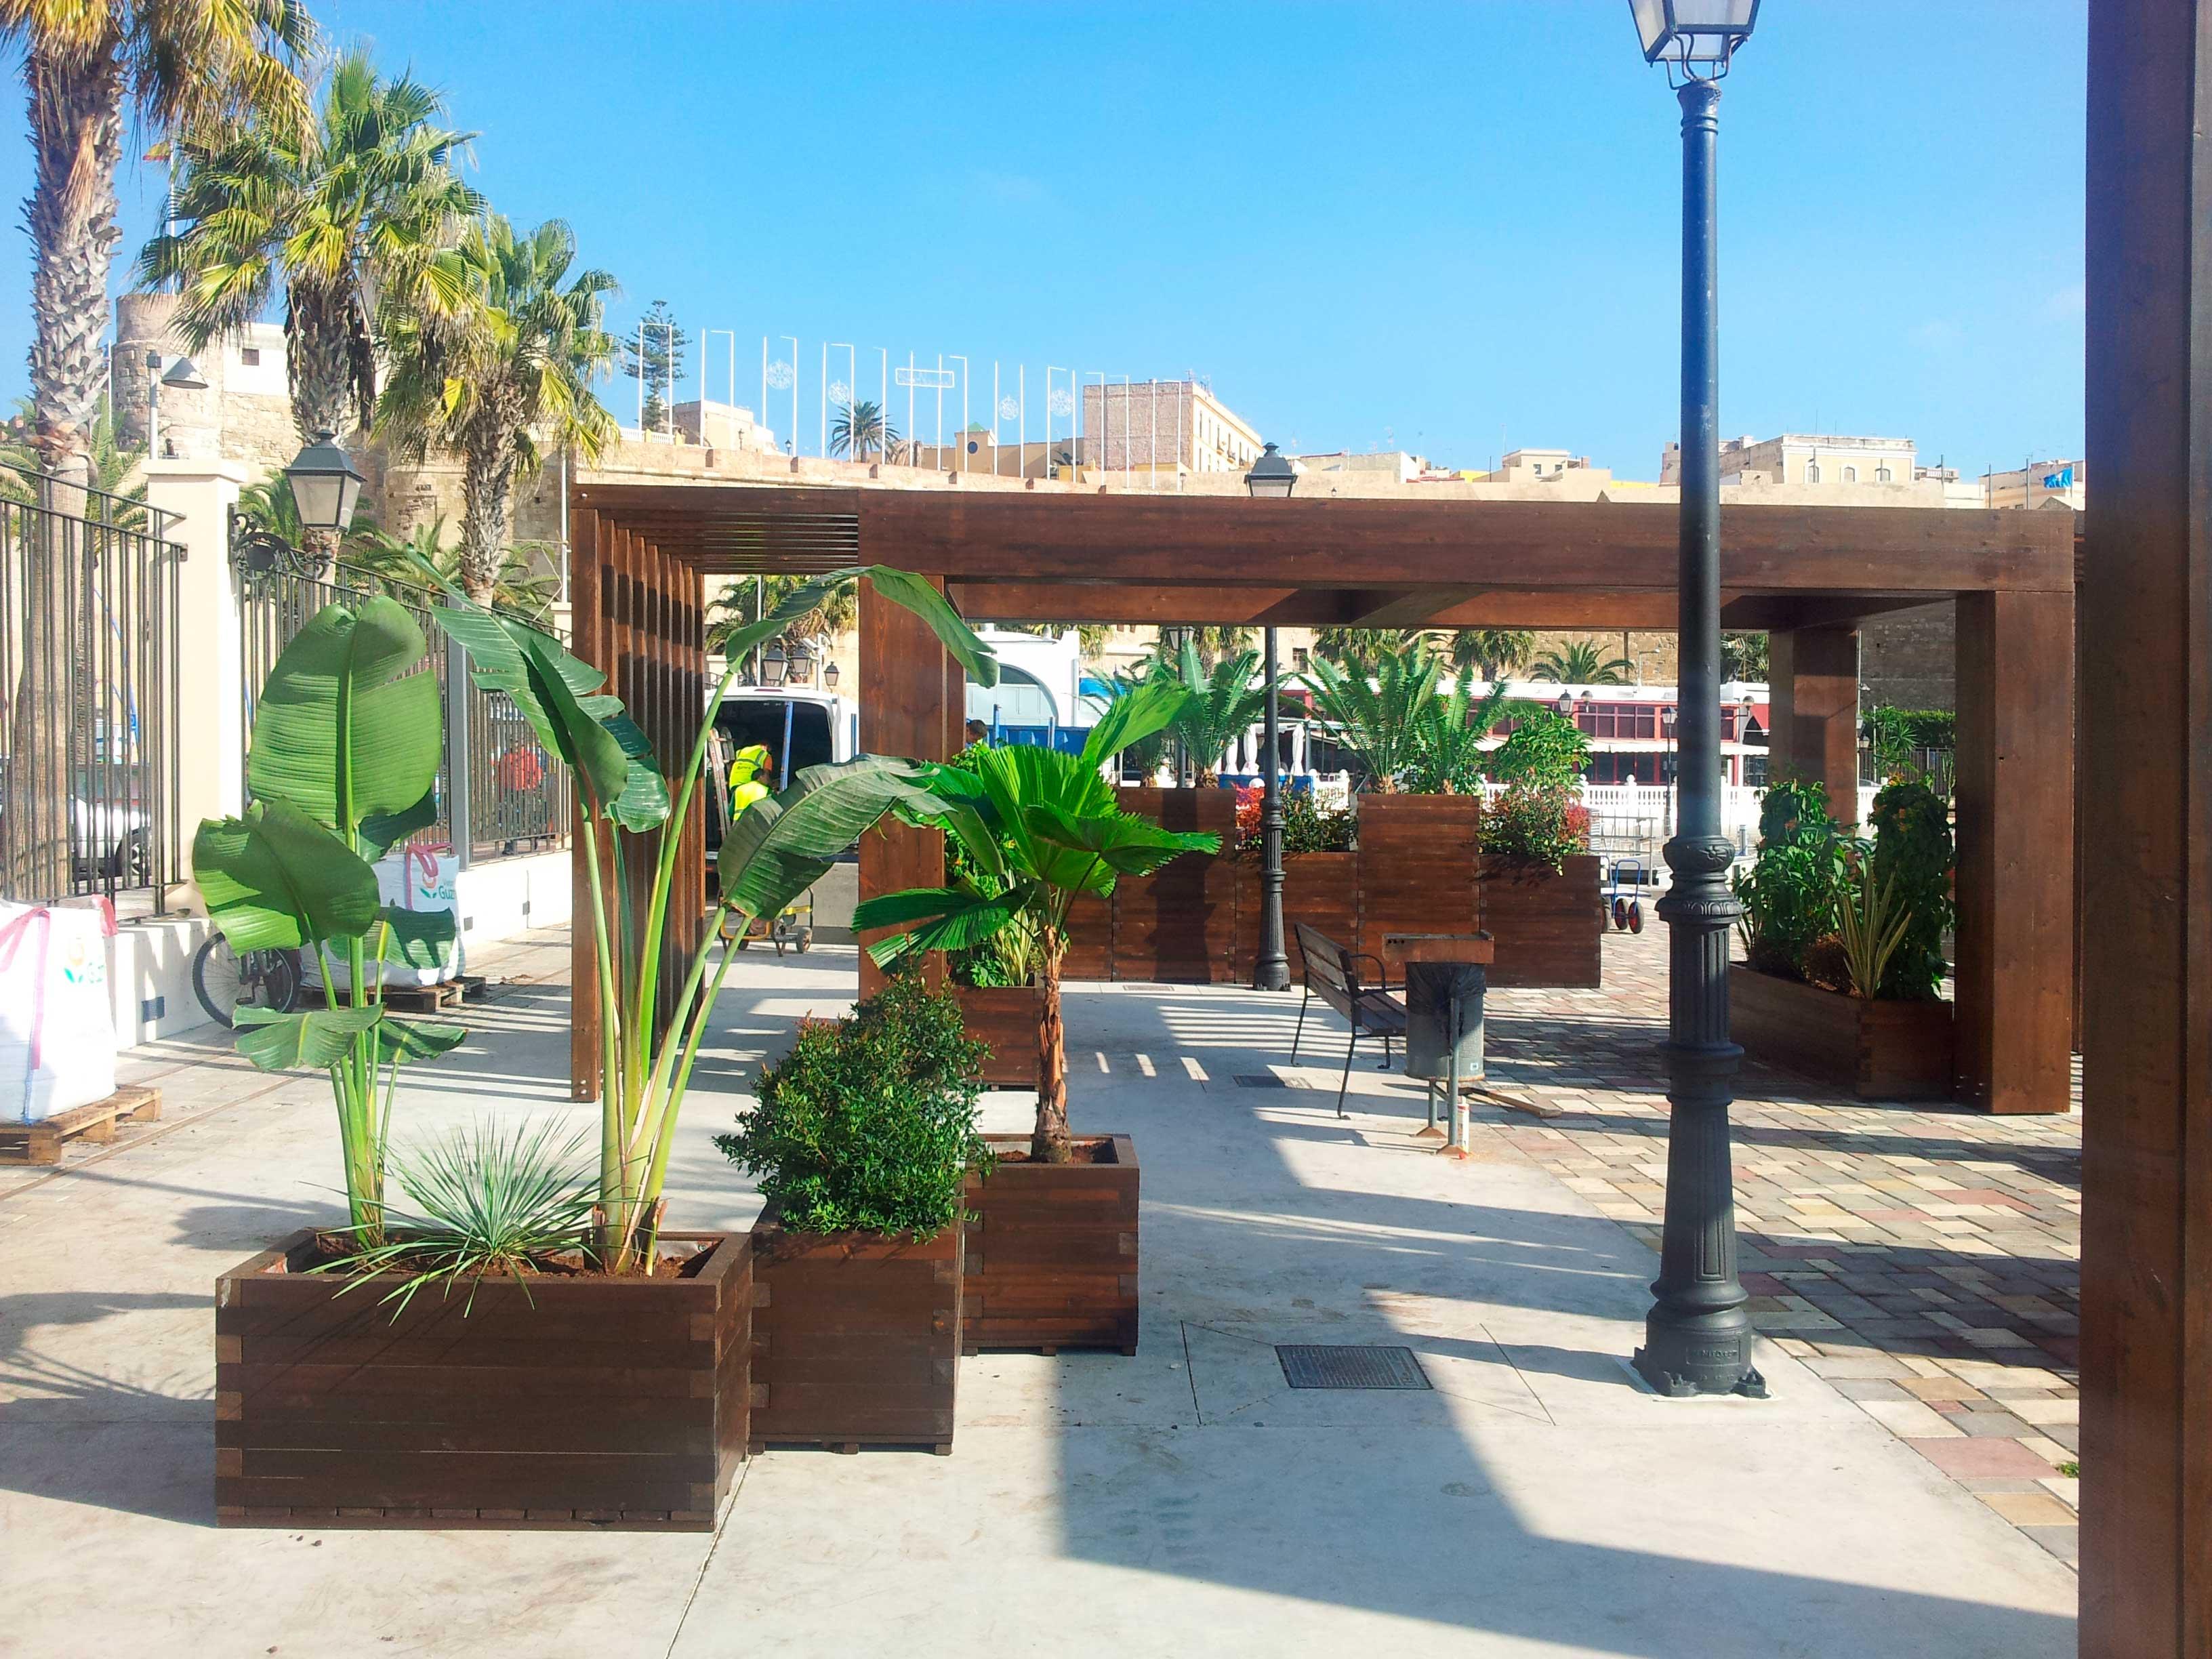 Pérgolas-Puerto-de-Melilla1